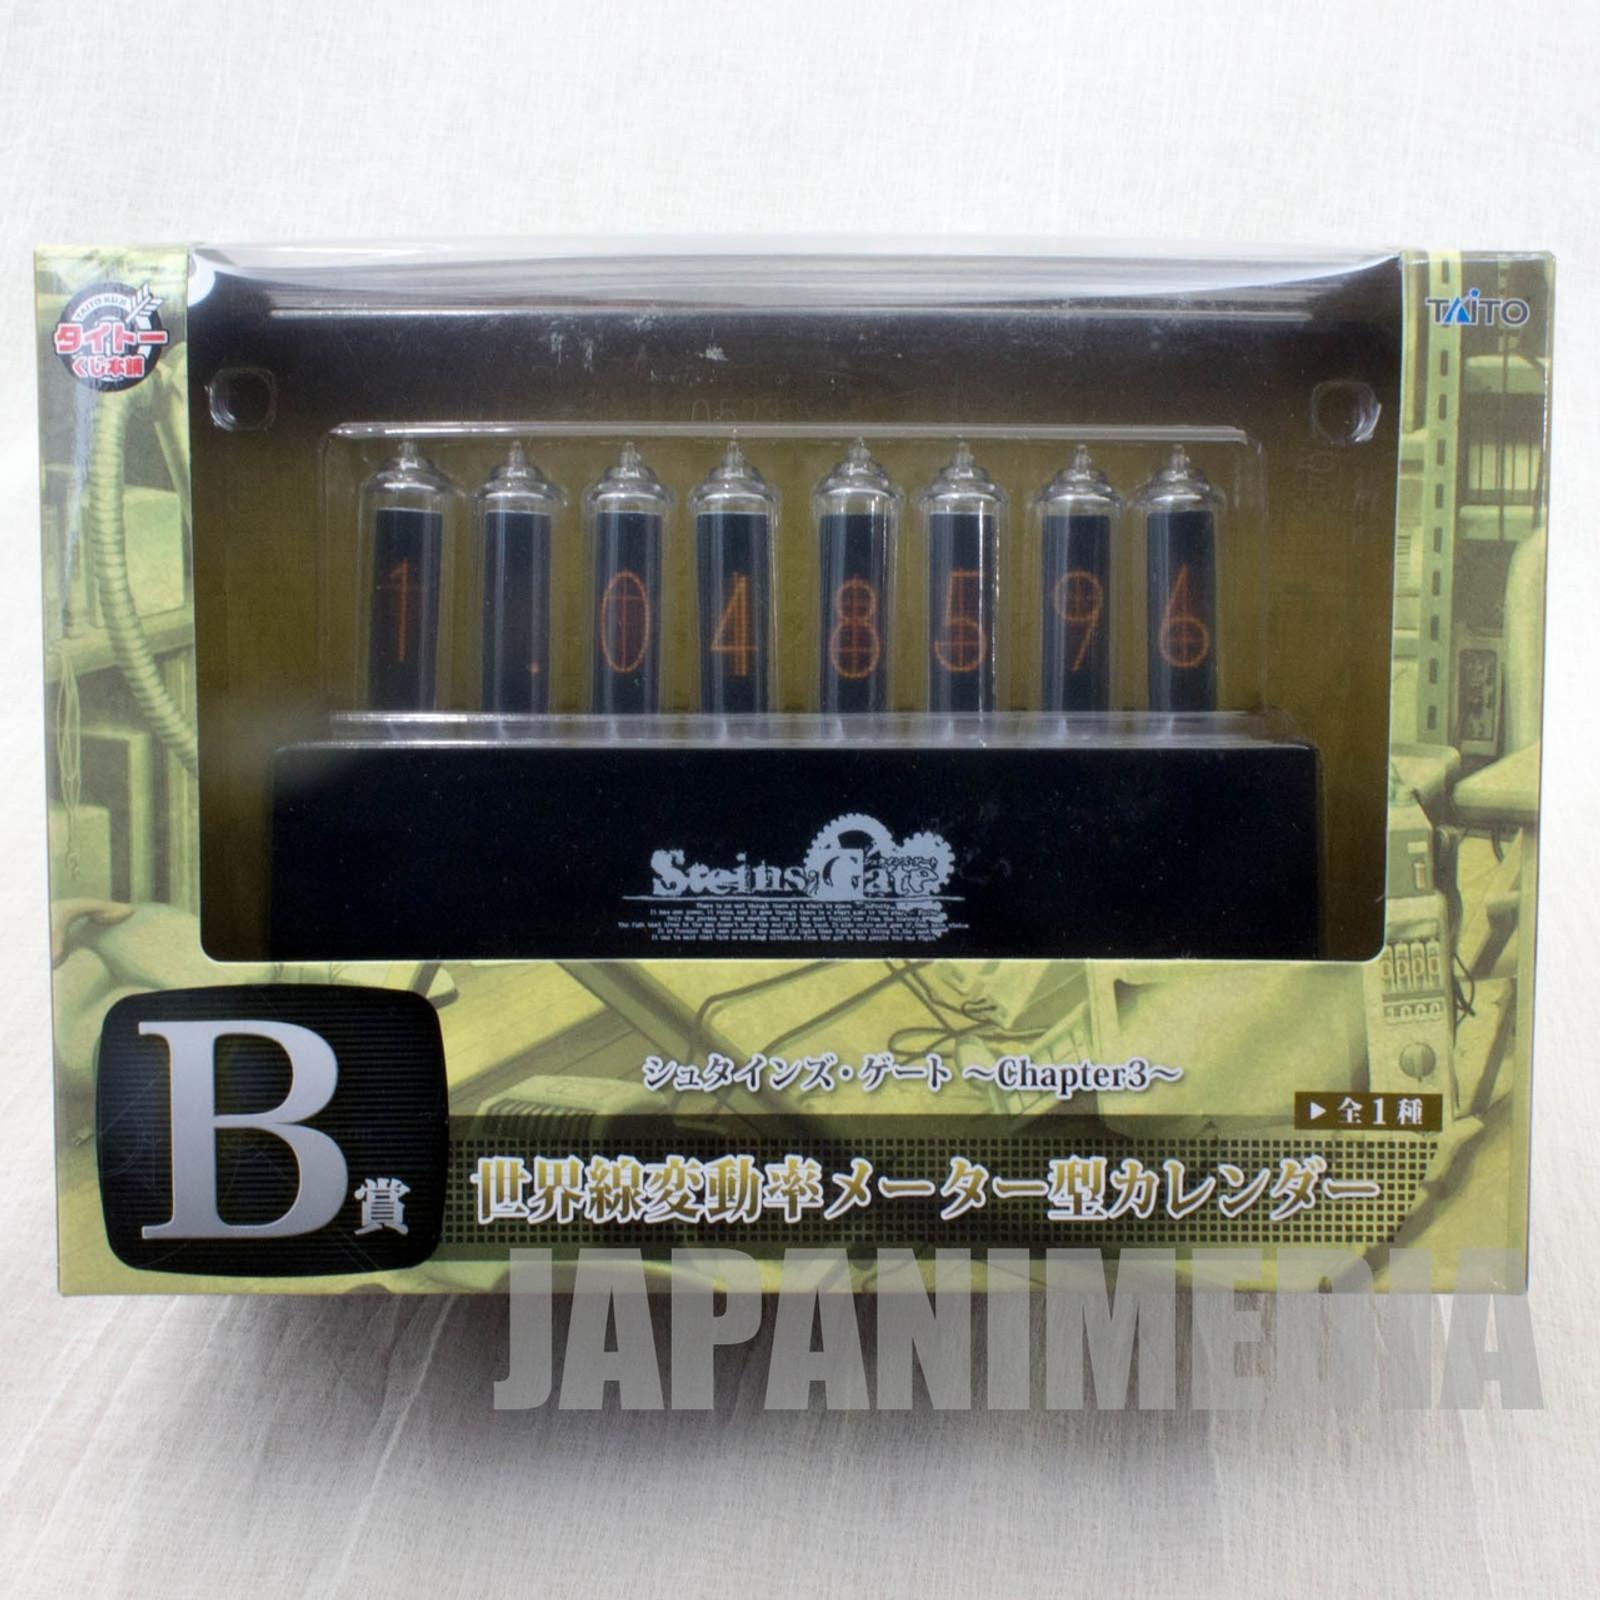 Steins ; Gate Divergence Meter Figure type Calendar Taito Kuji JAPAN ANIME MANGA